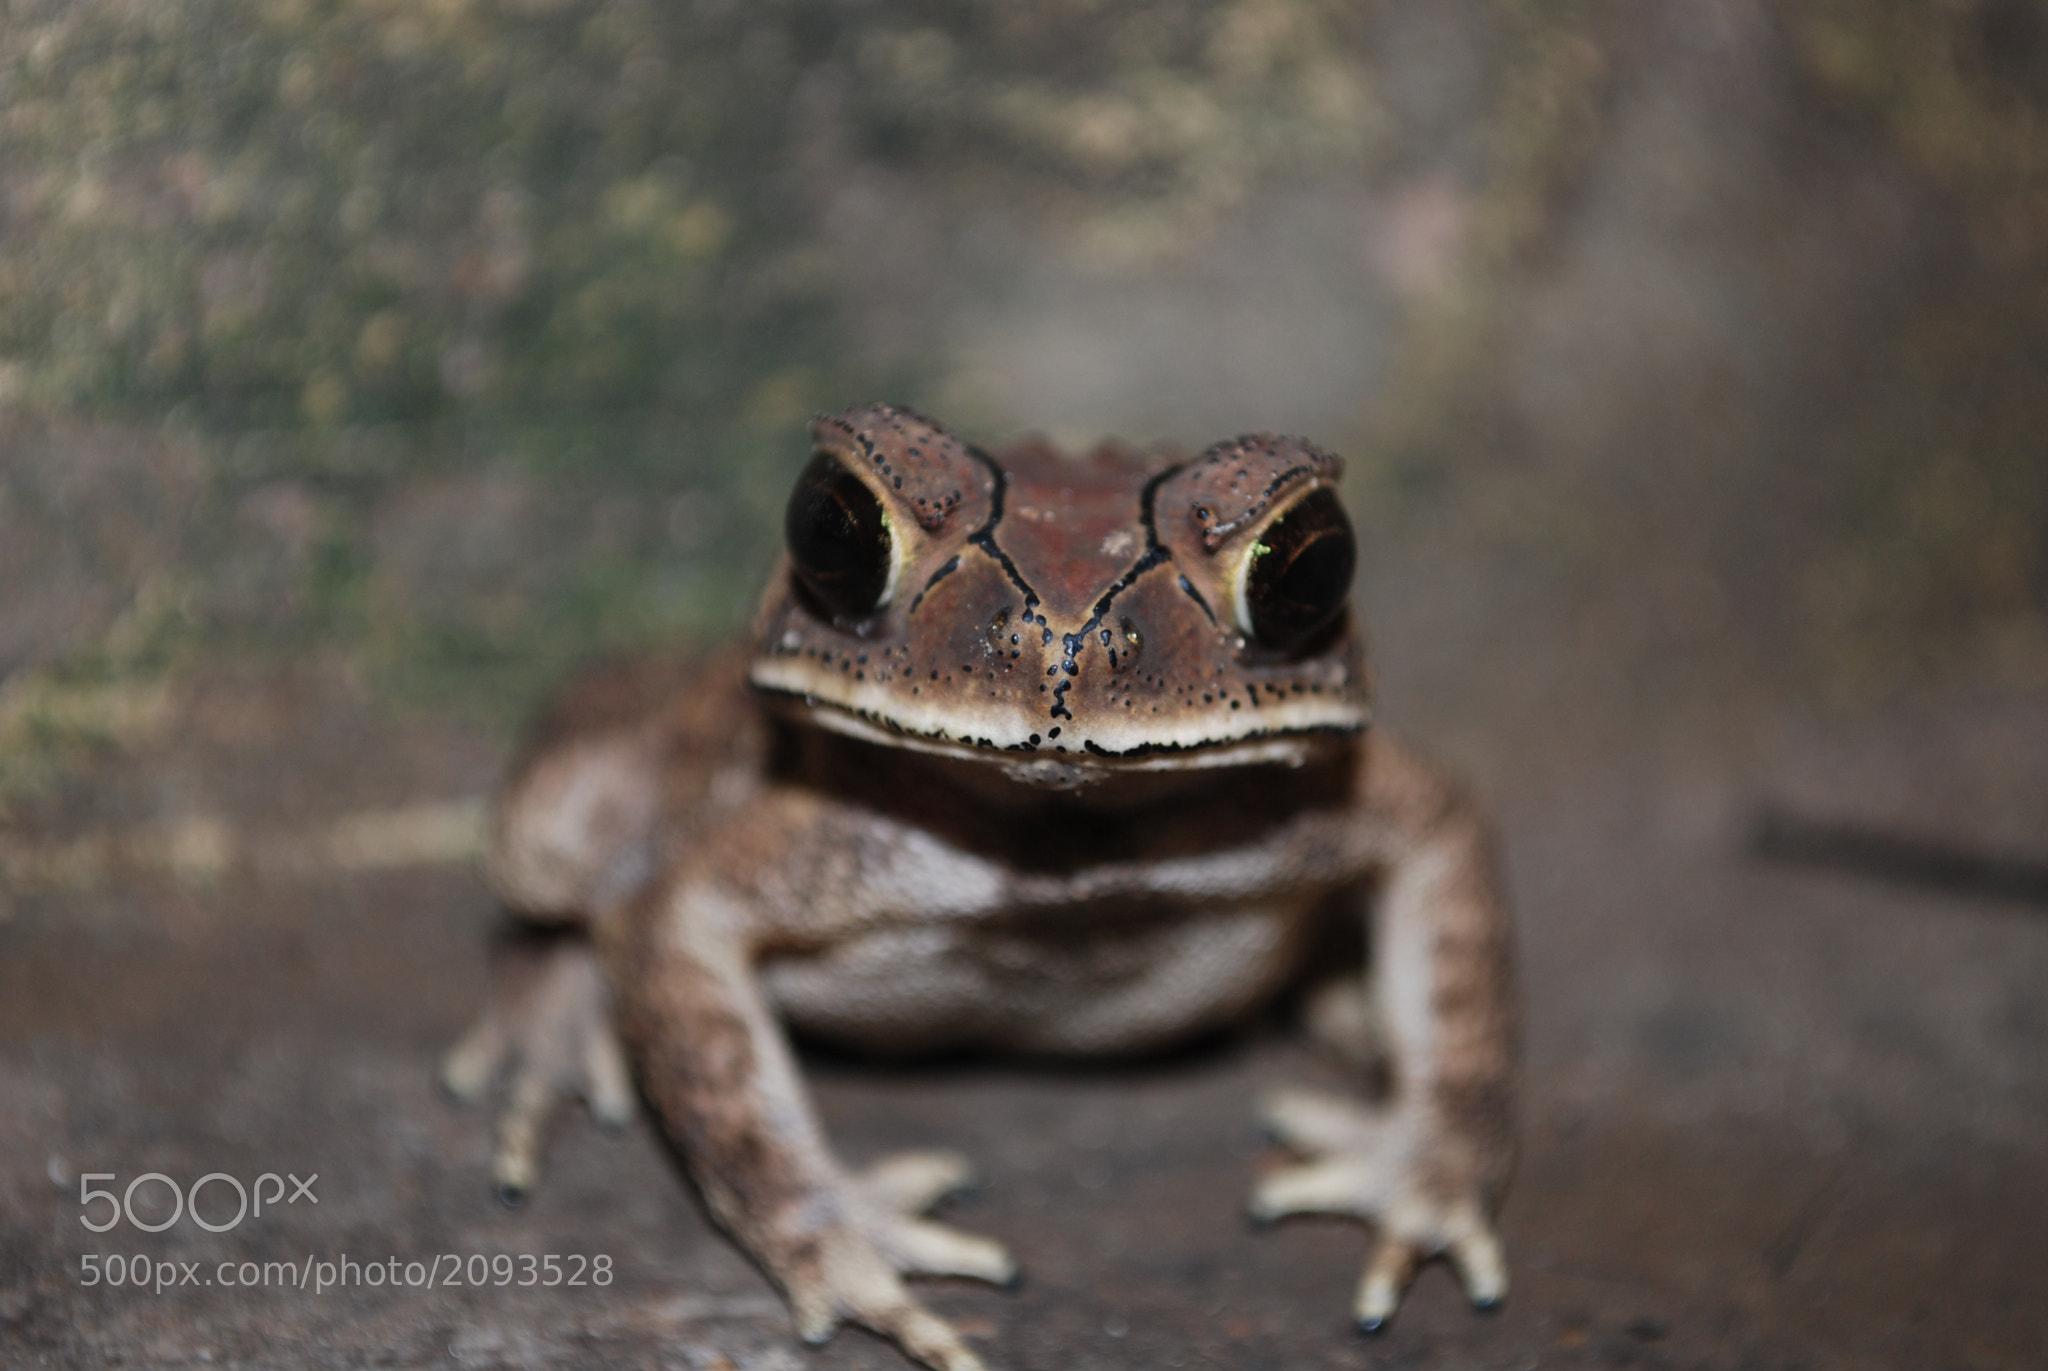 Photograph Frog by Sai Ji on 500px